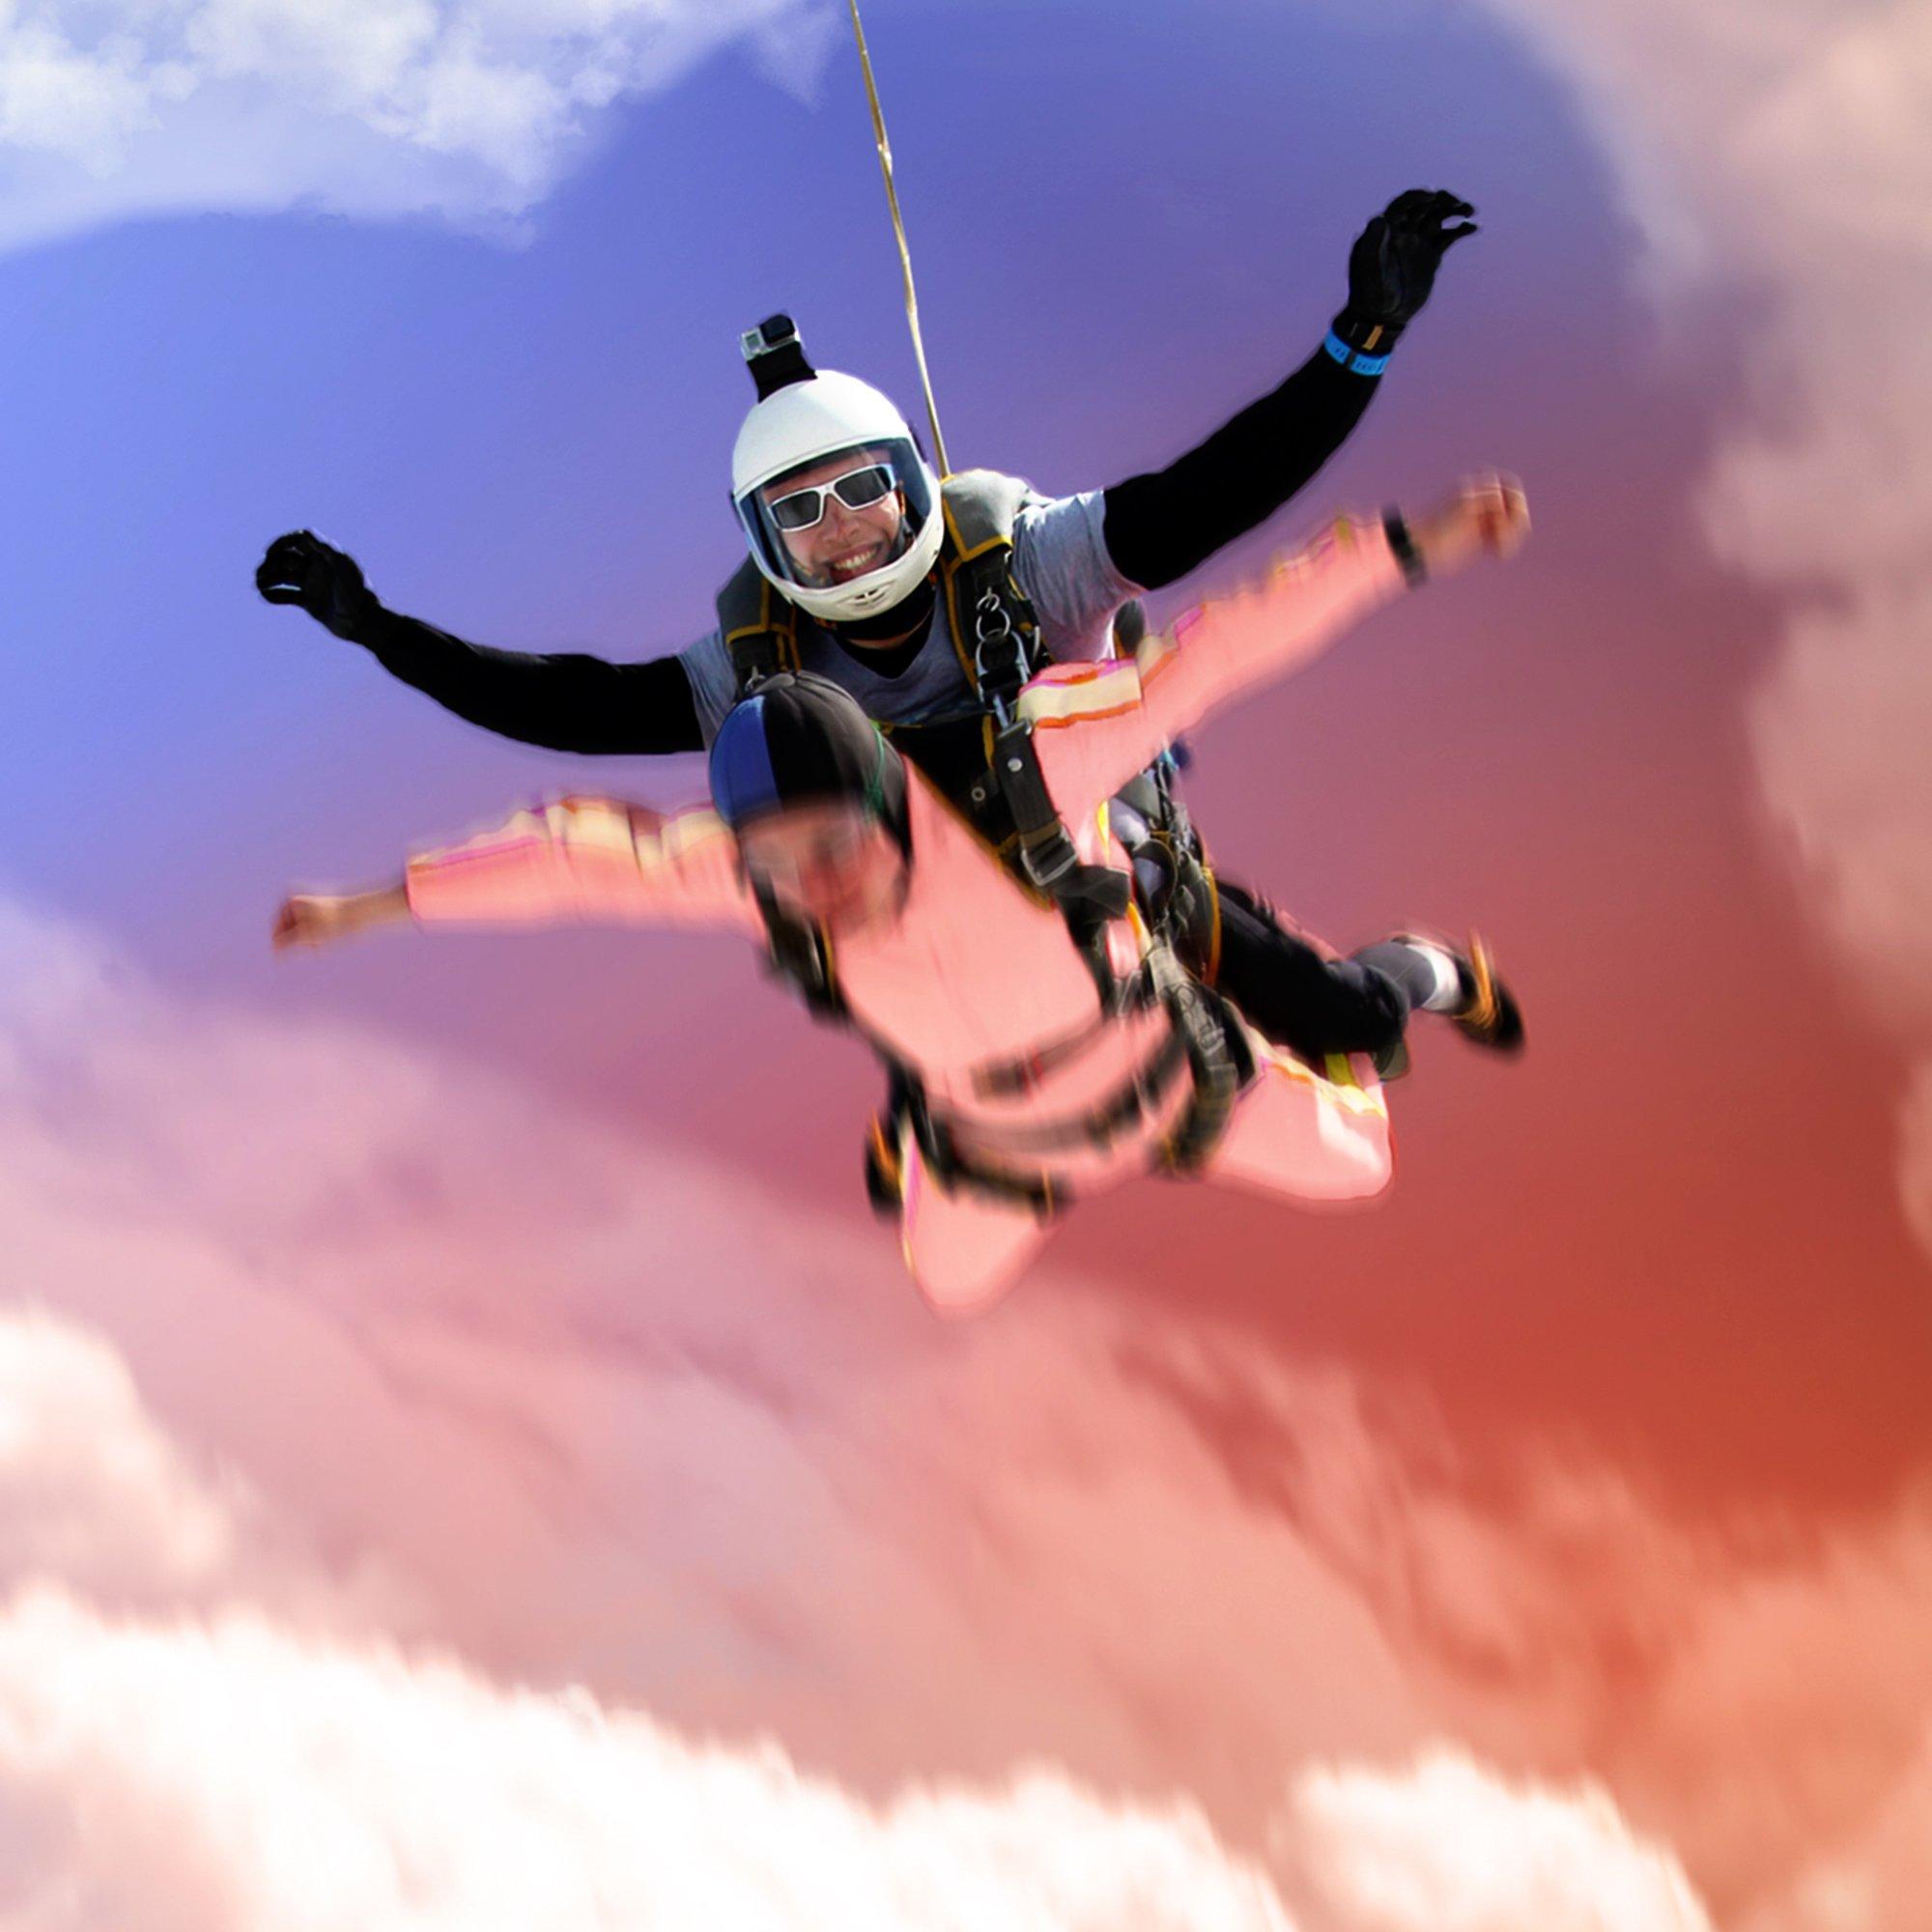 Romantischer Fallschirmsprung durch Wolke 7 - 6